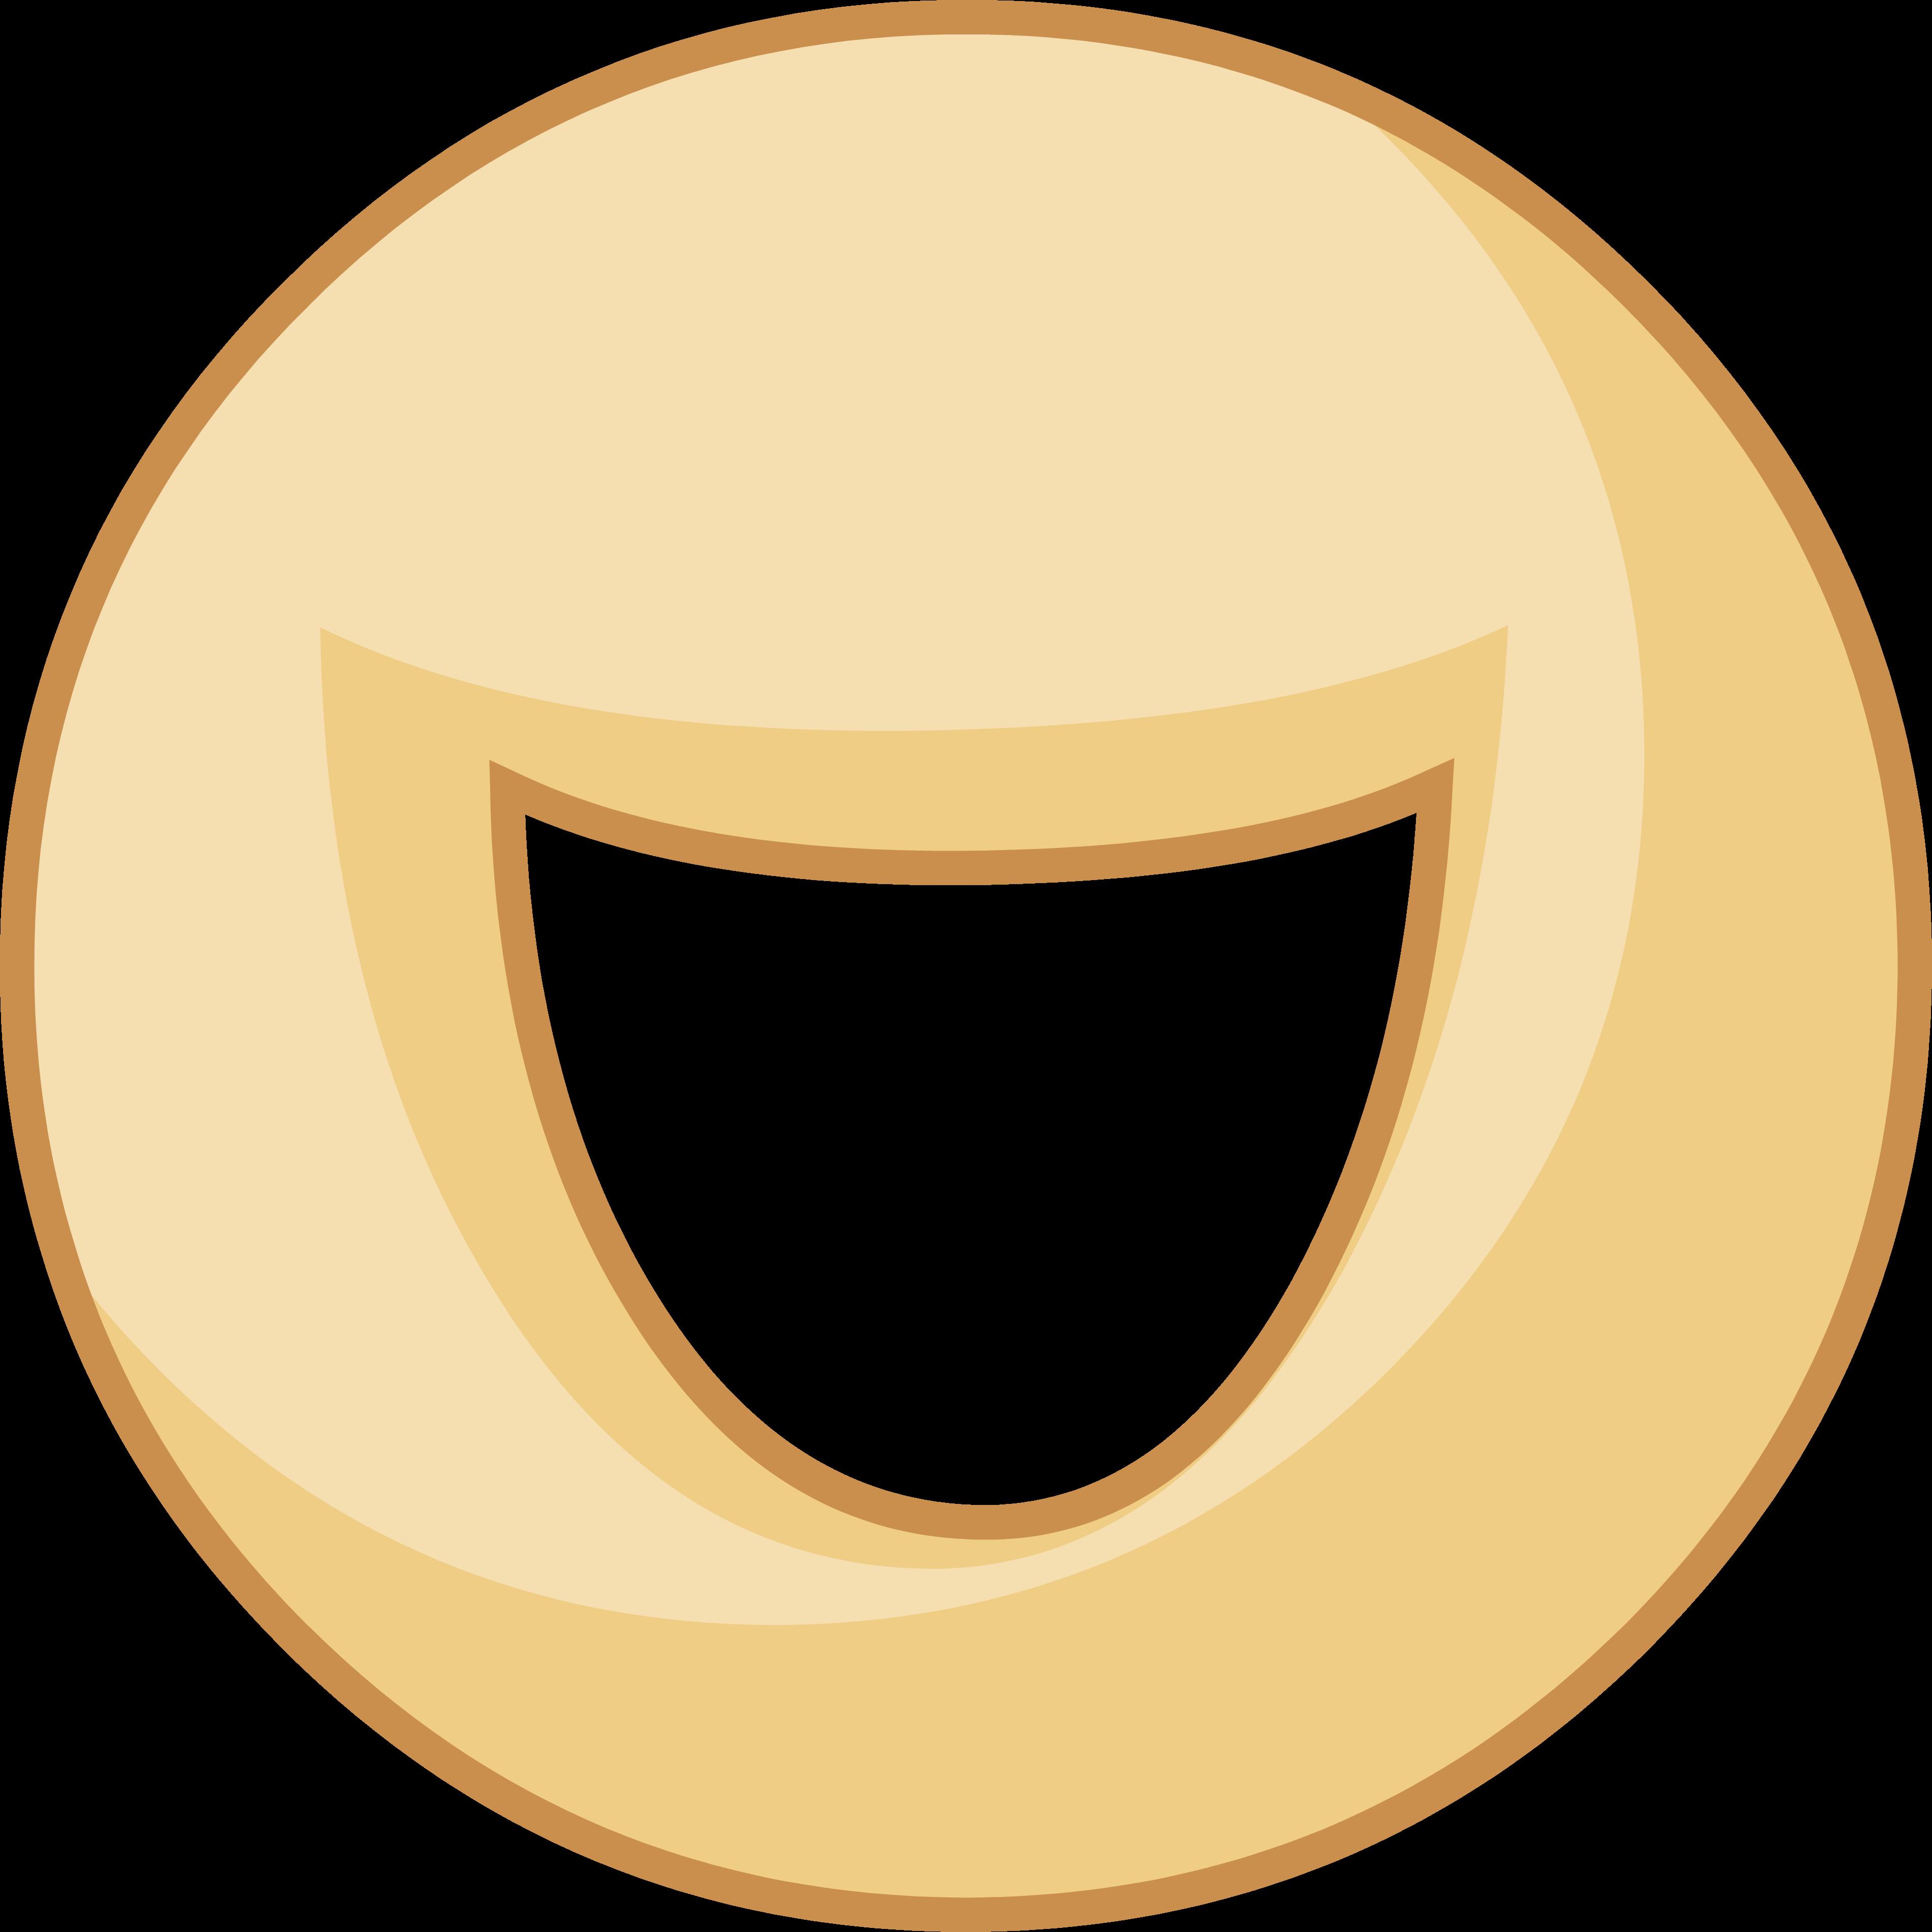 File:Donut C Smile0002.png